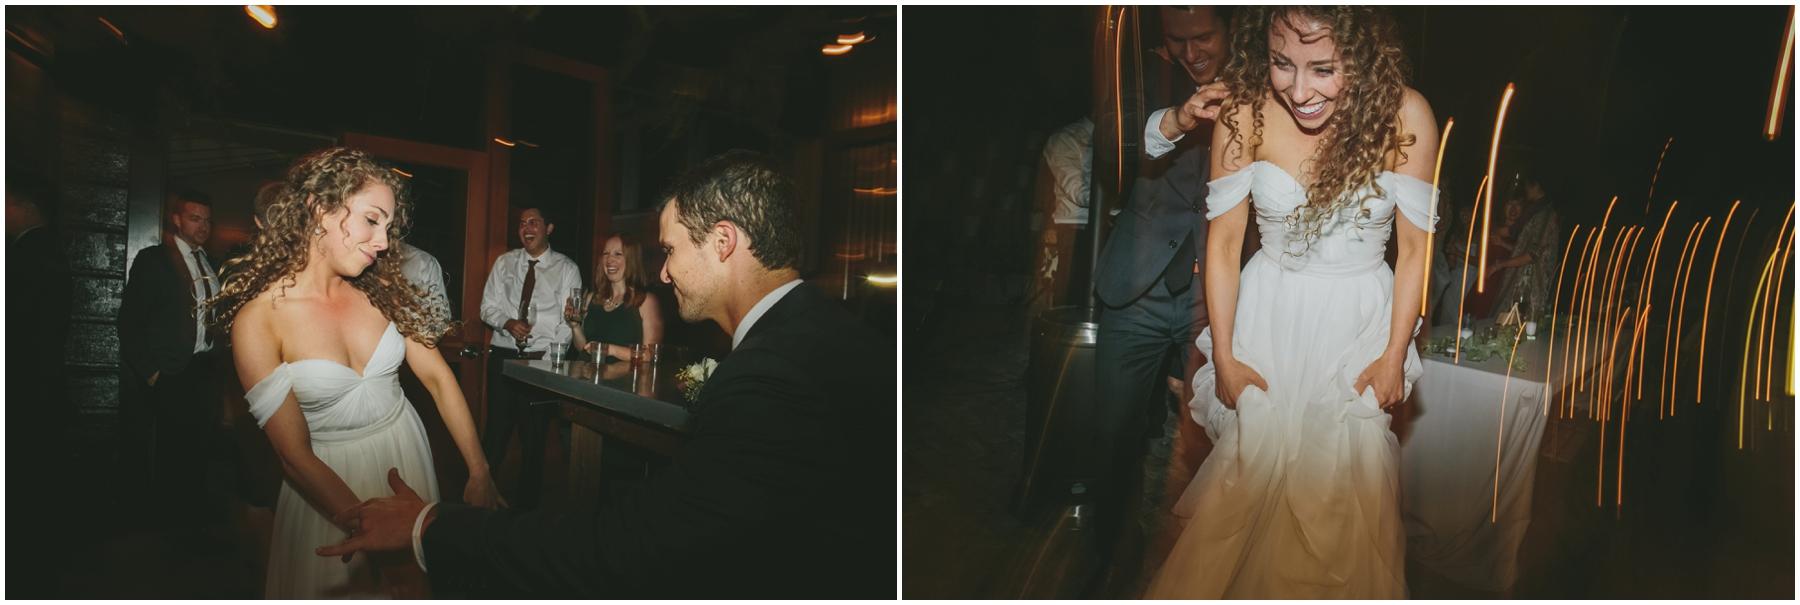 Emily+Paul-WEDDING_KellyBoitanoPhotography_0172